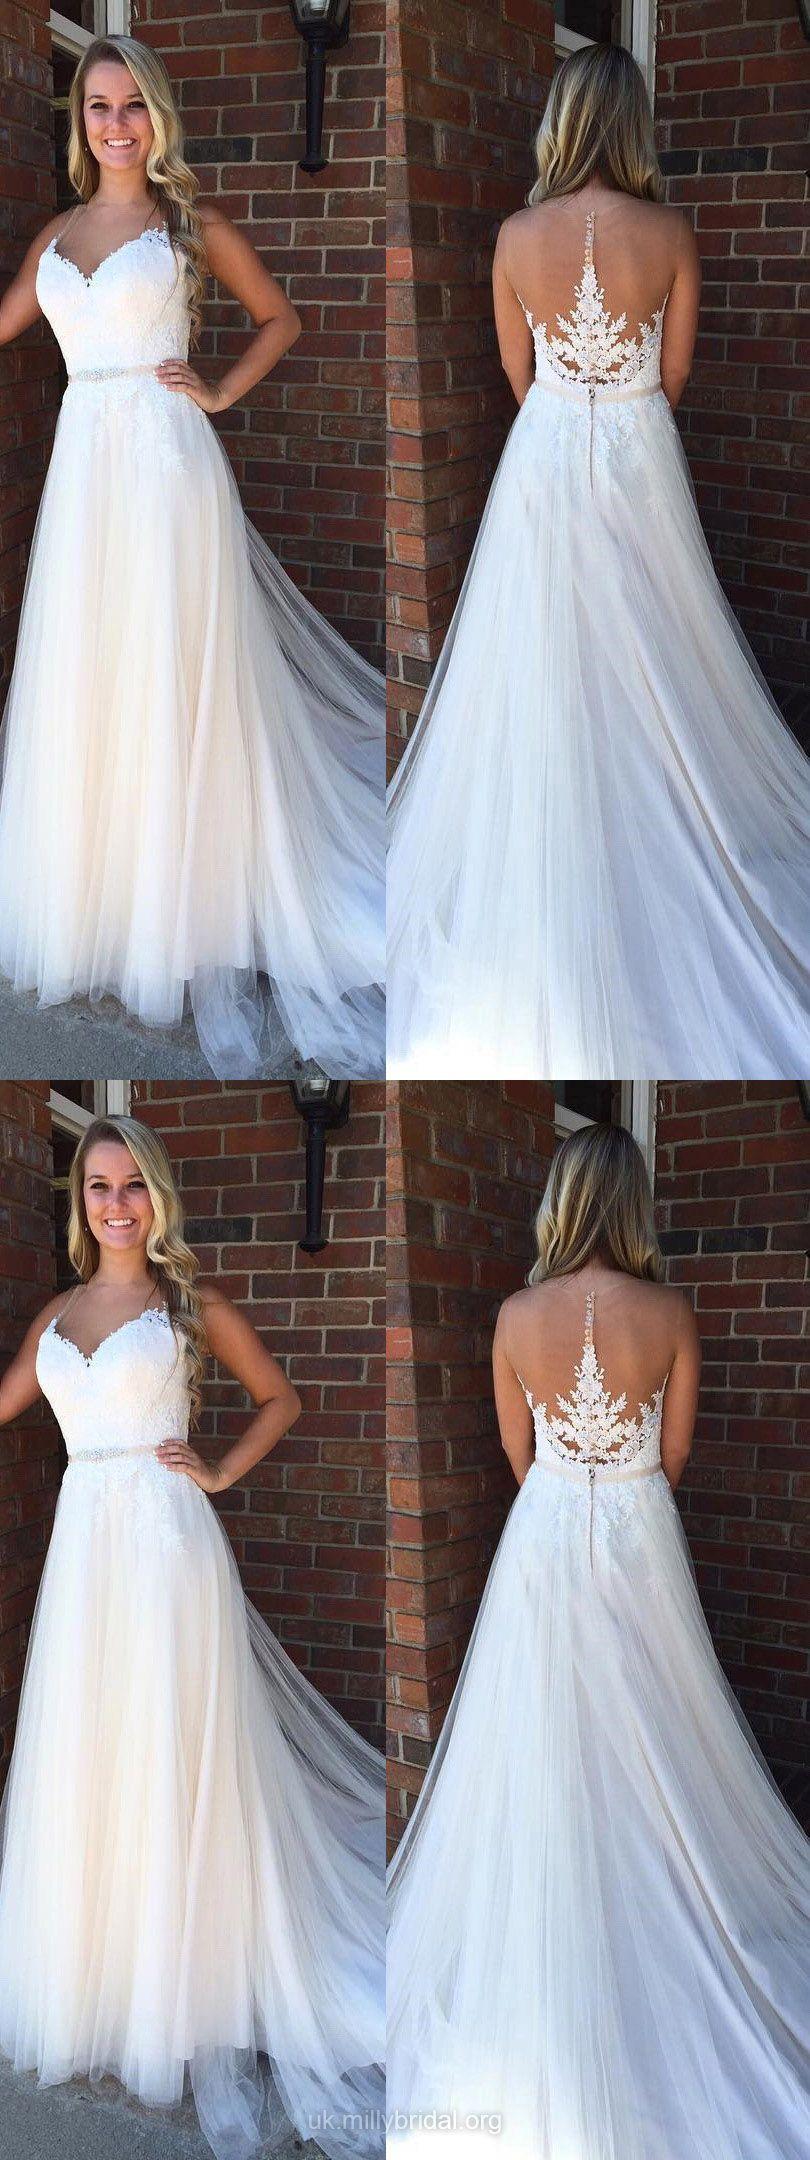 White formal dresses long princess prom dresses for teens elegant